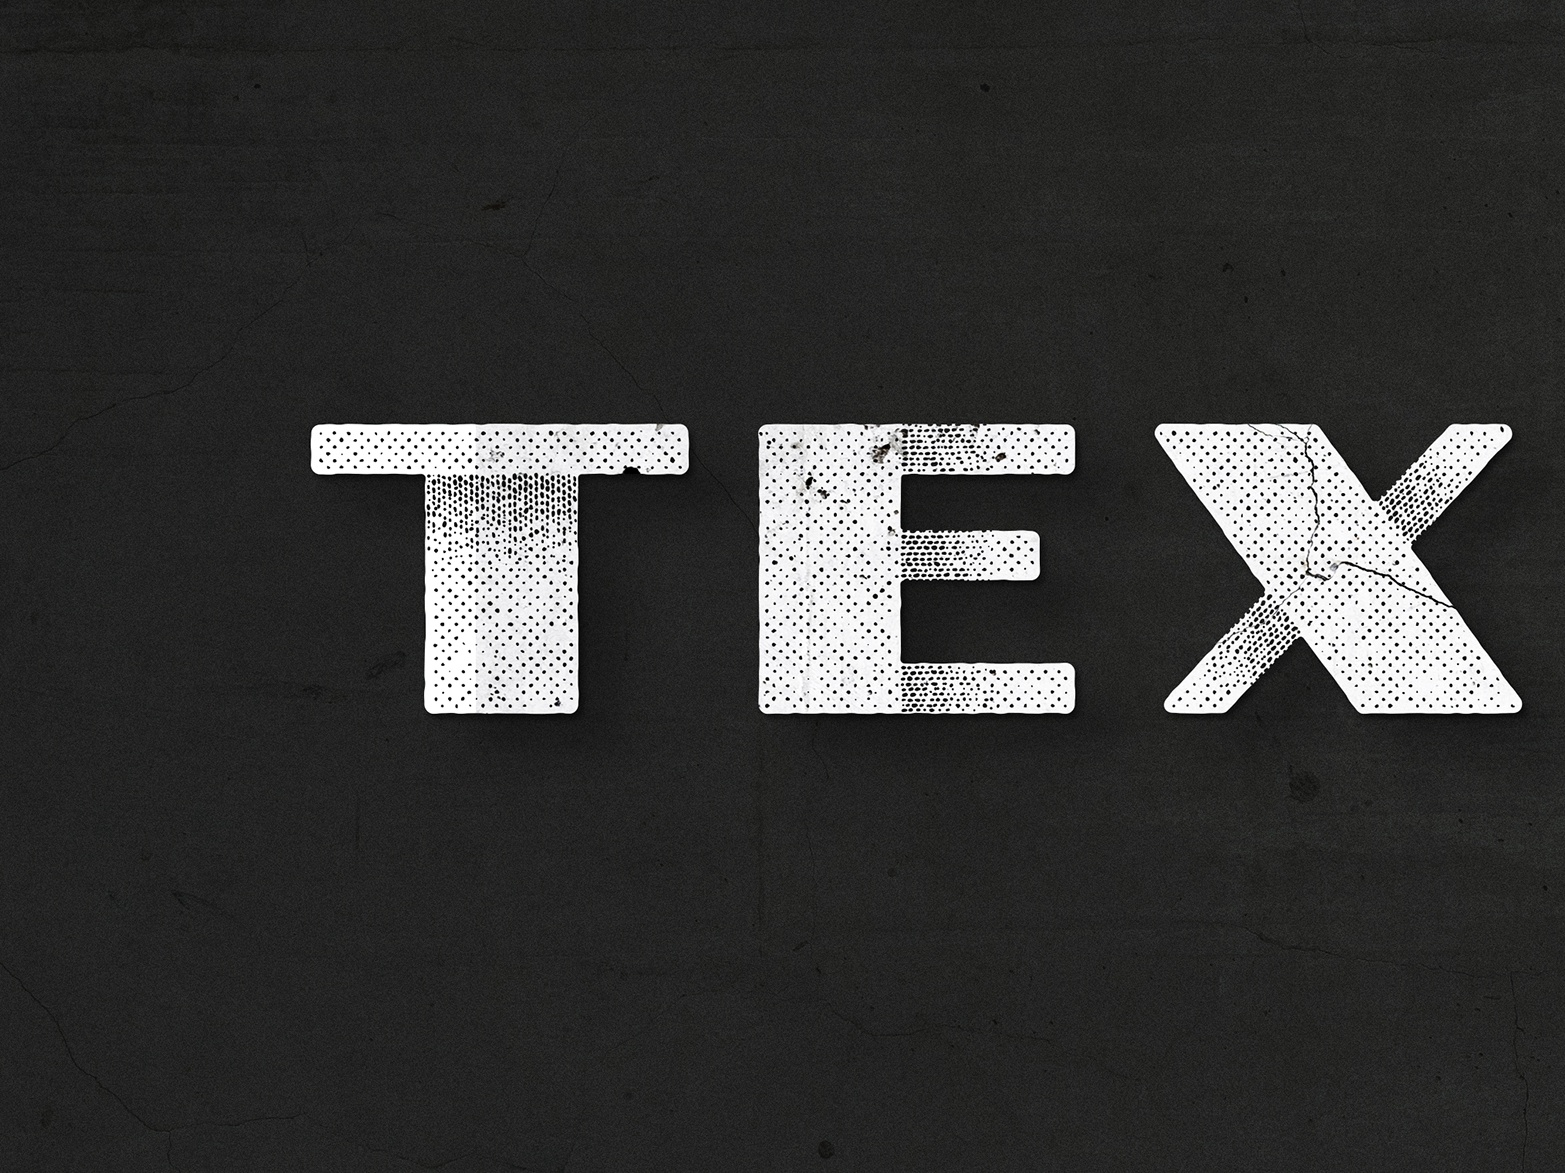 01 texture tank logo texture 02